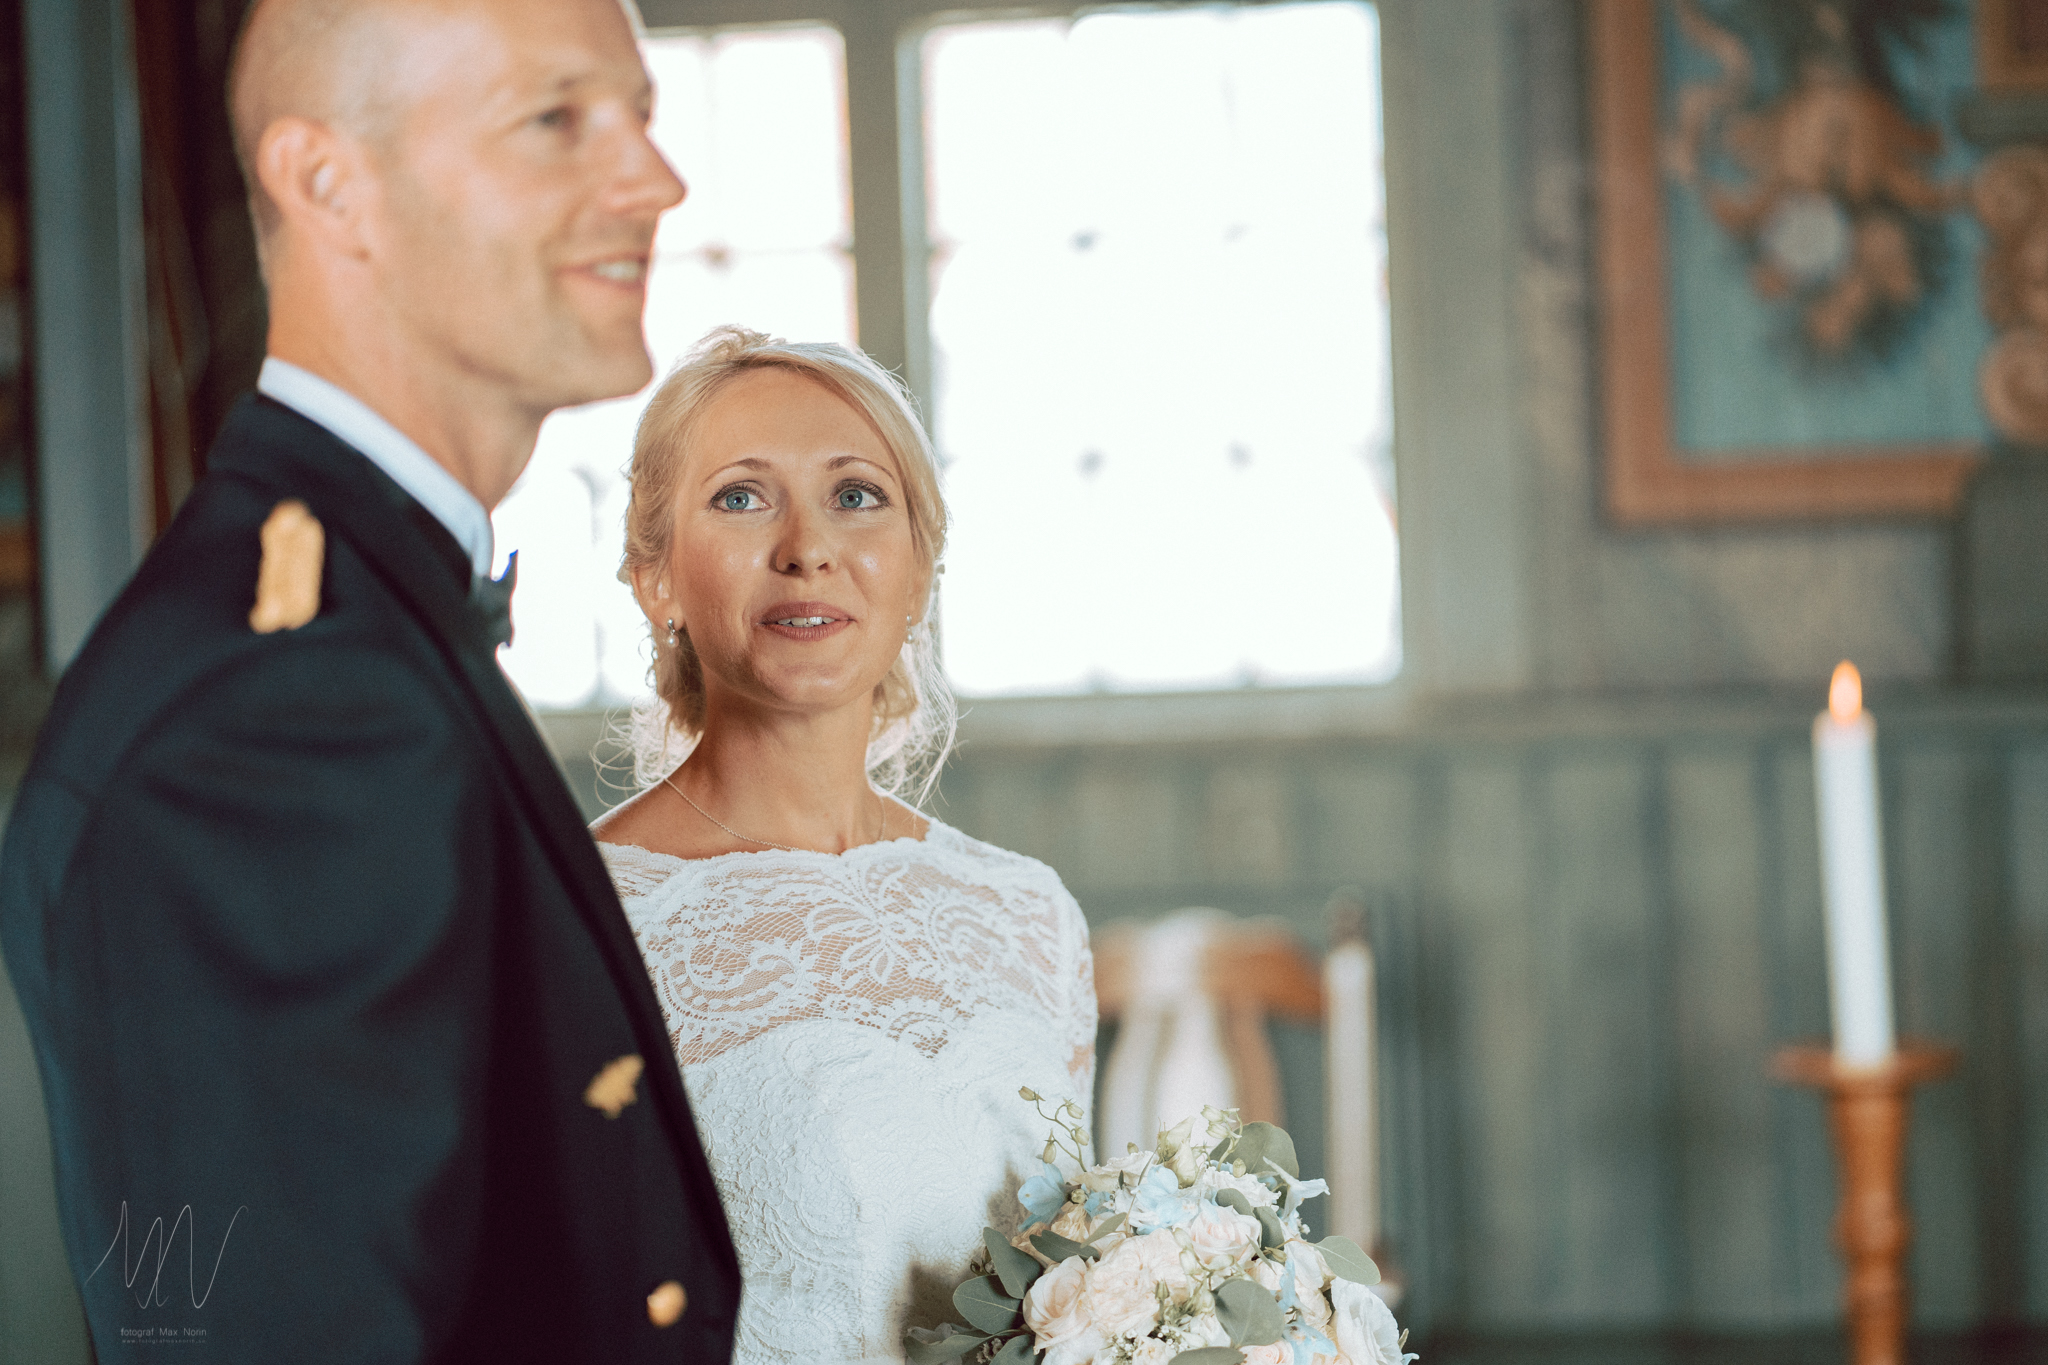 Bröllop-fotografmaxnorin.se-MariaMarcus-75.JPG